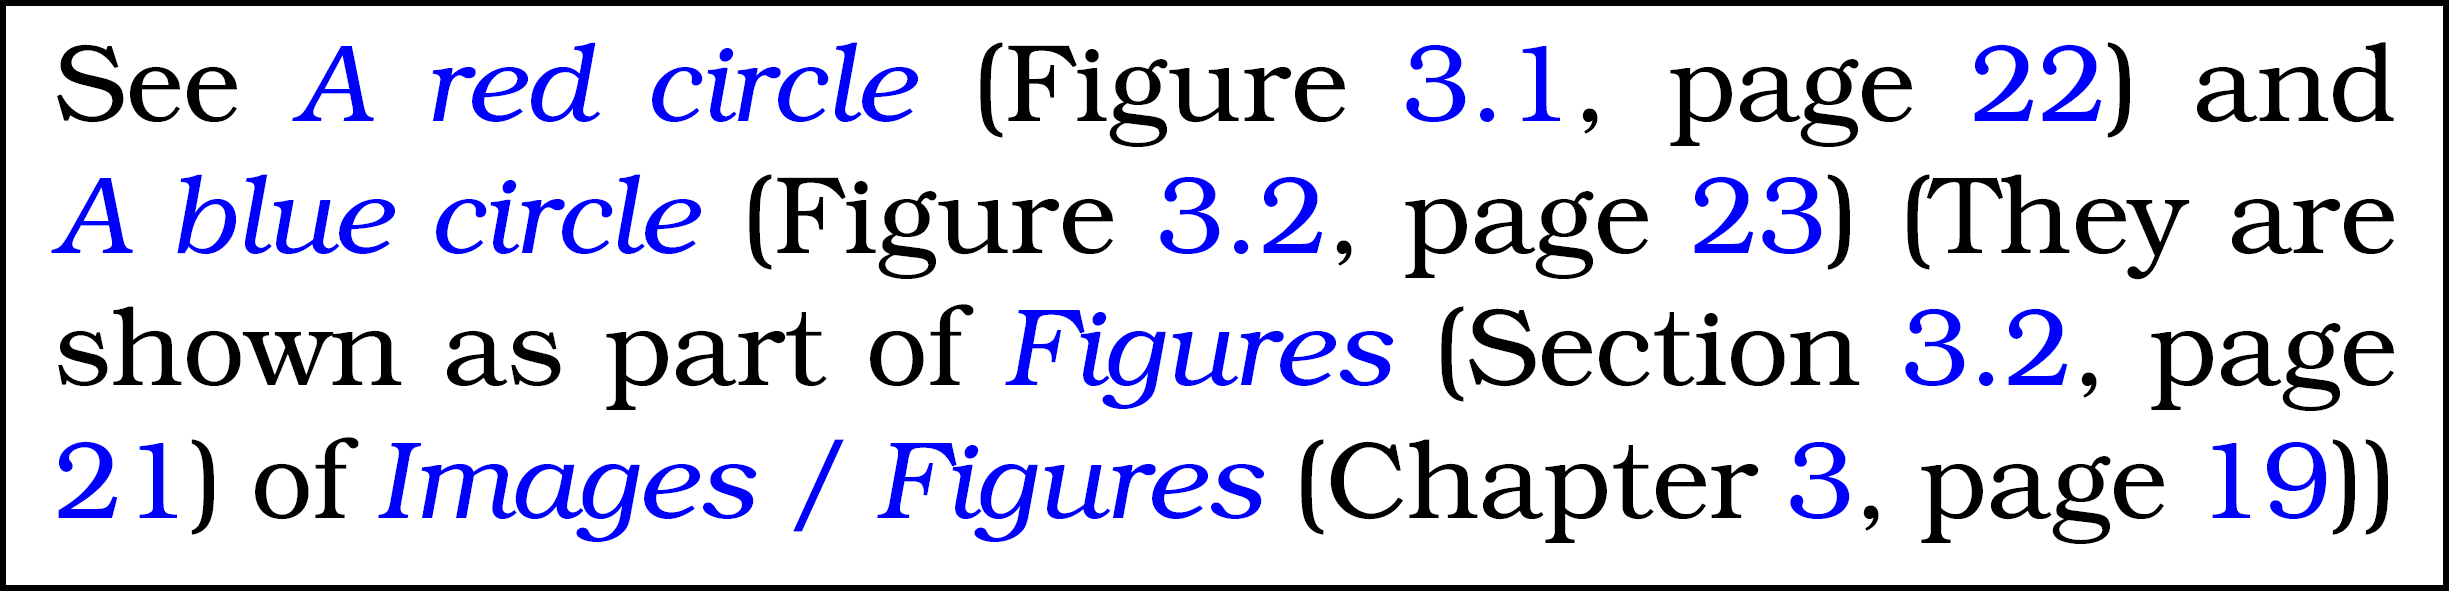 1 1 3 pdf ebook vs print book ratatouille